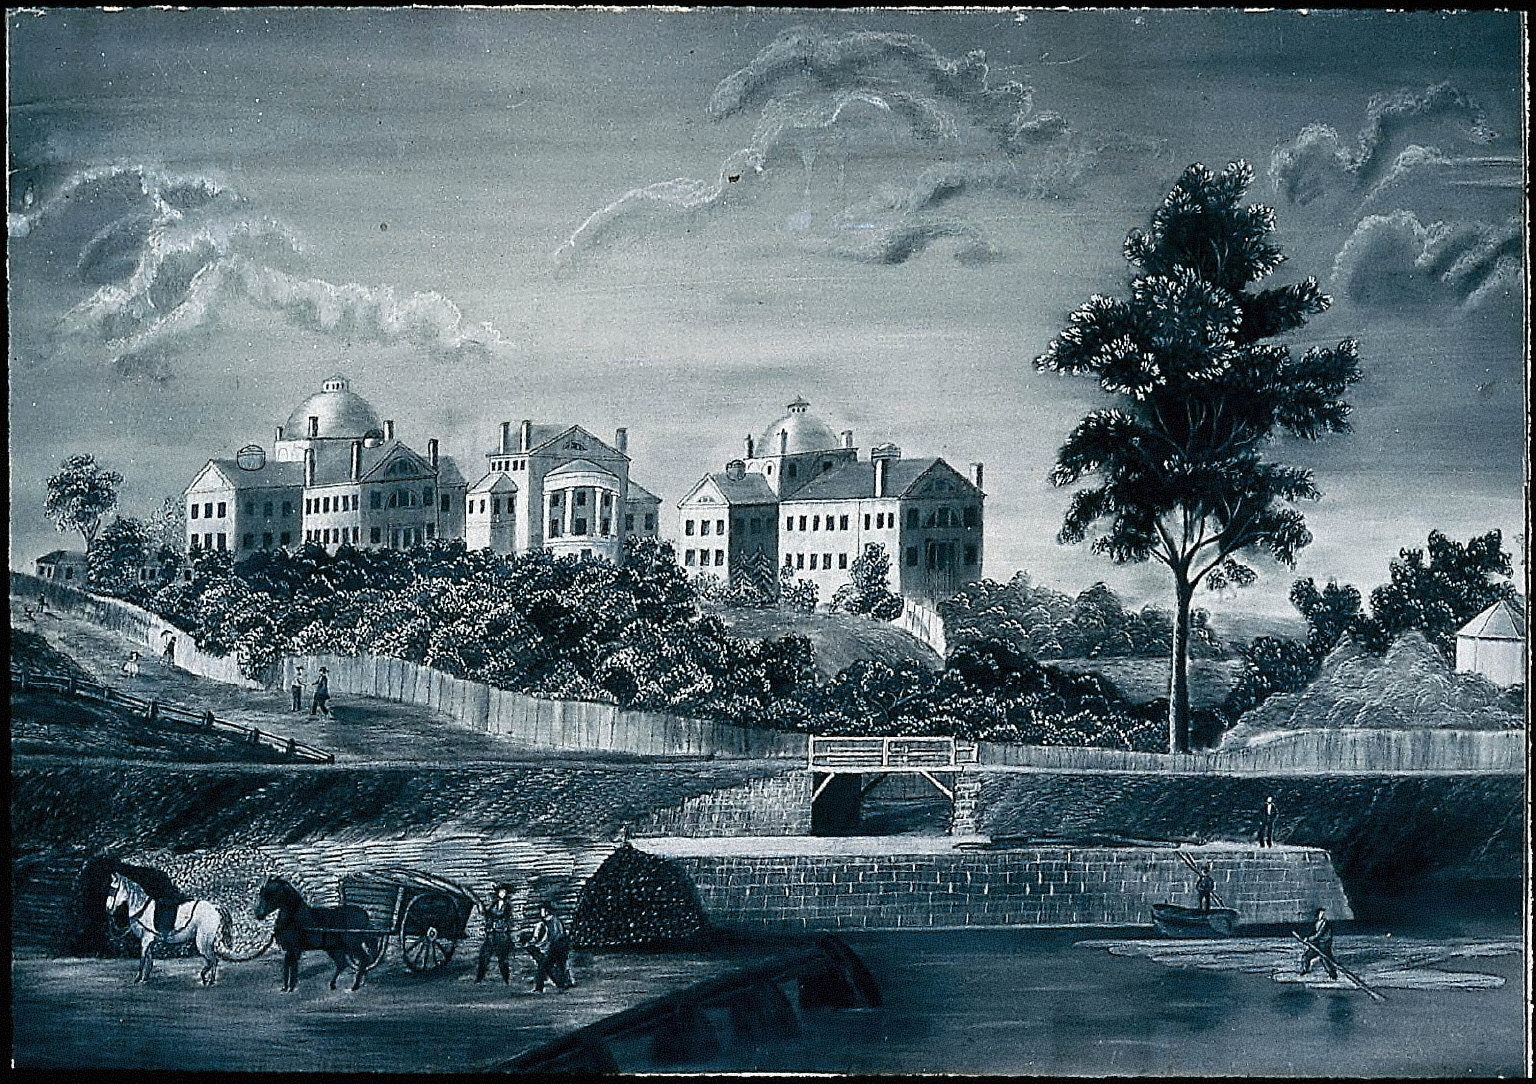 MacLean Asylum, Charlestown, Mass.